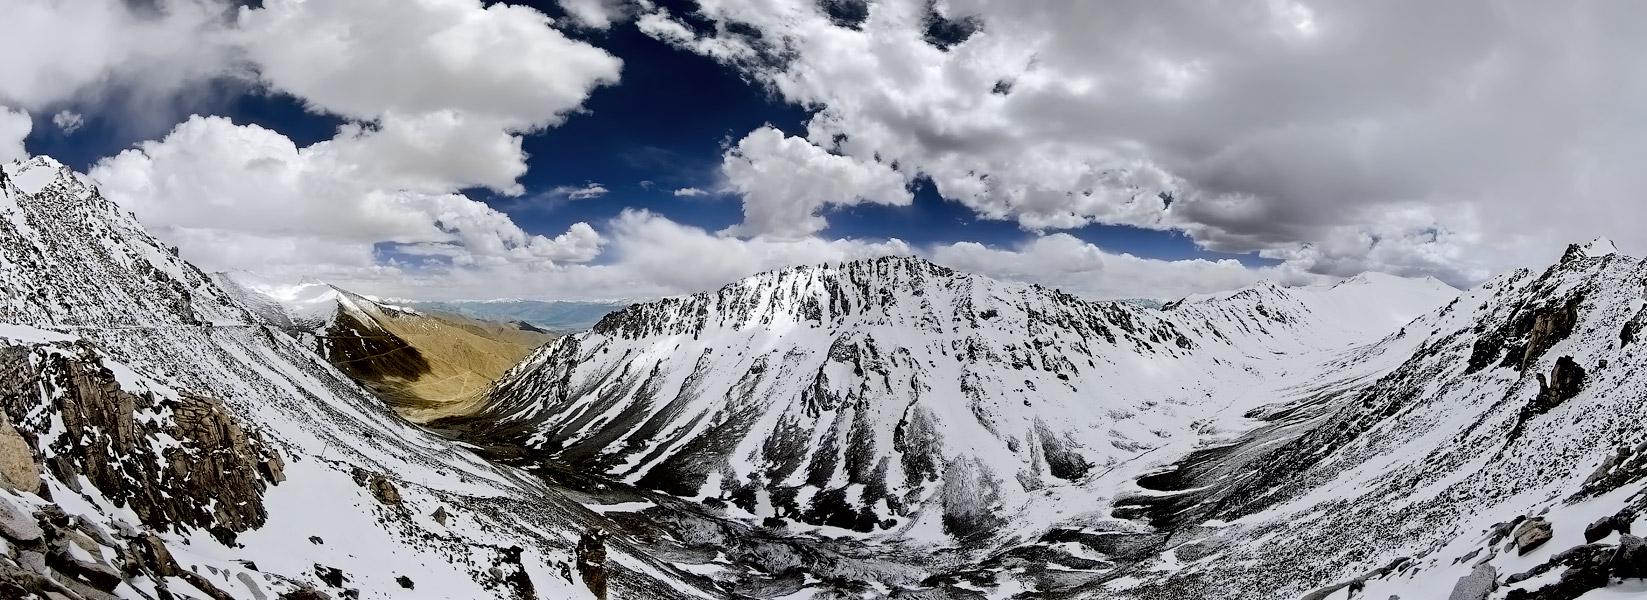 Перевал Кхардунг Ла. Ладакх, Индия. Панорамы Гималаев